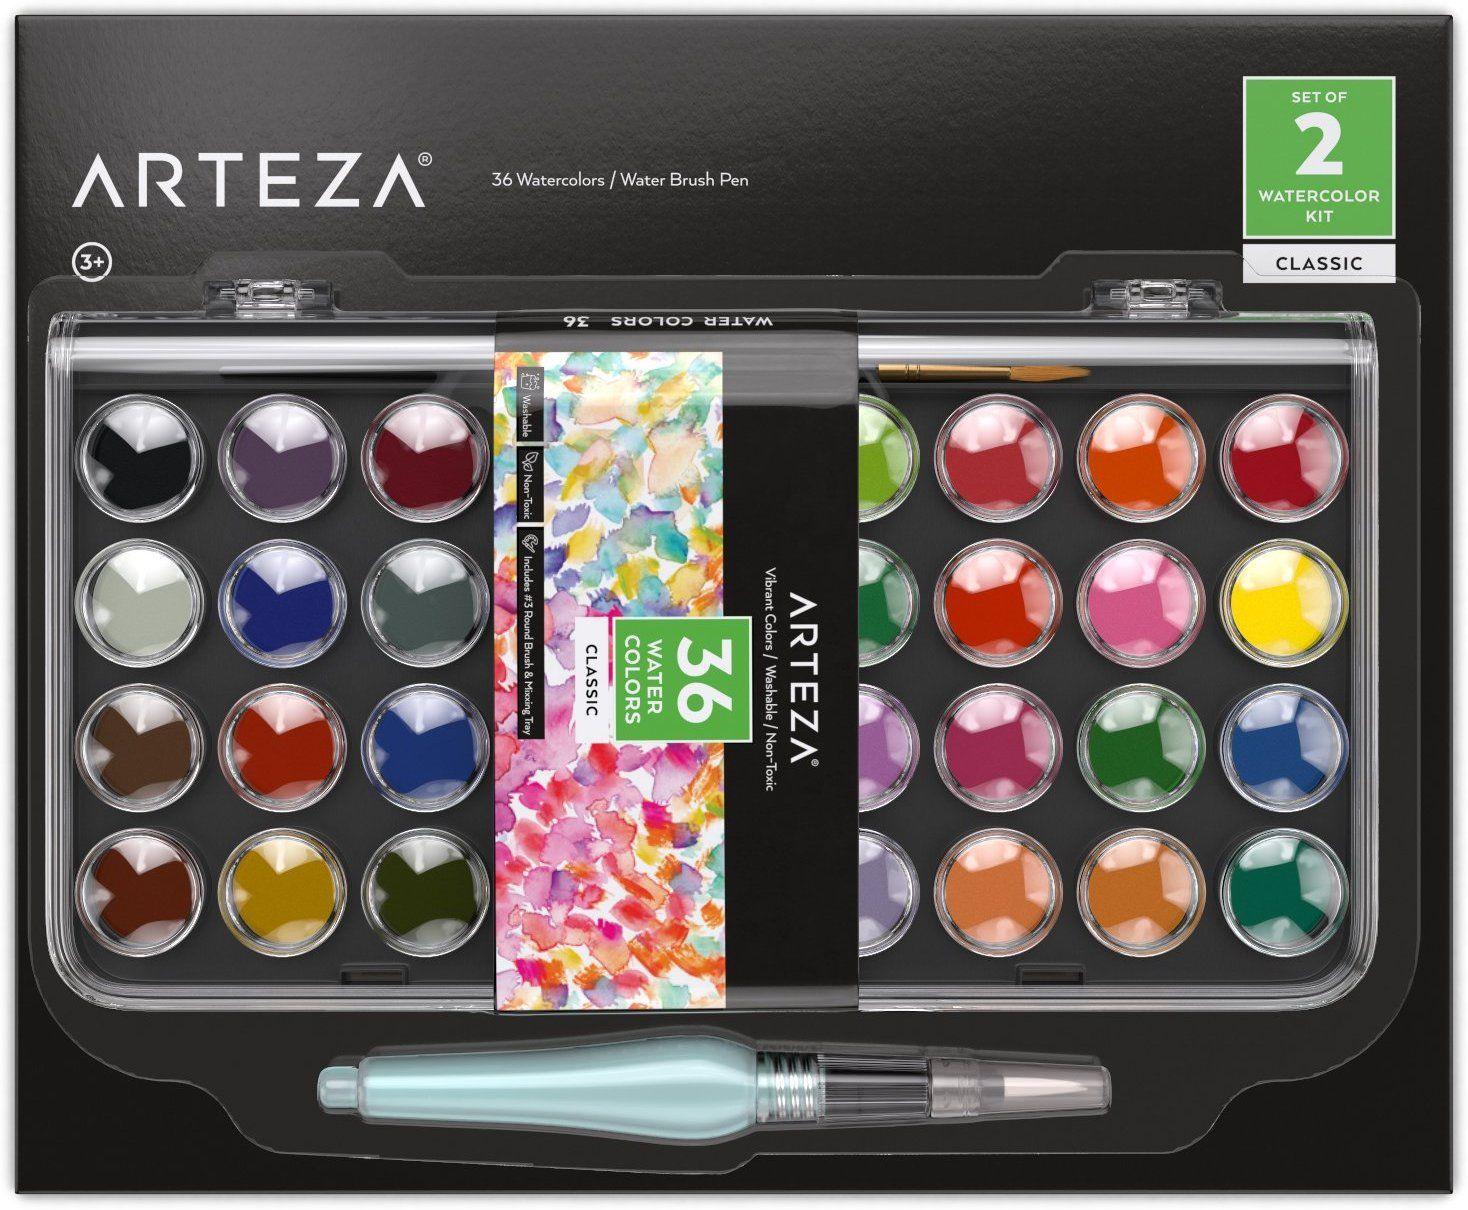 Arteza Classic Wasserfarben Kunstler Set Aquarellfarben Set Mit